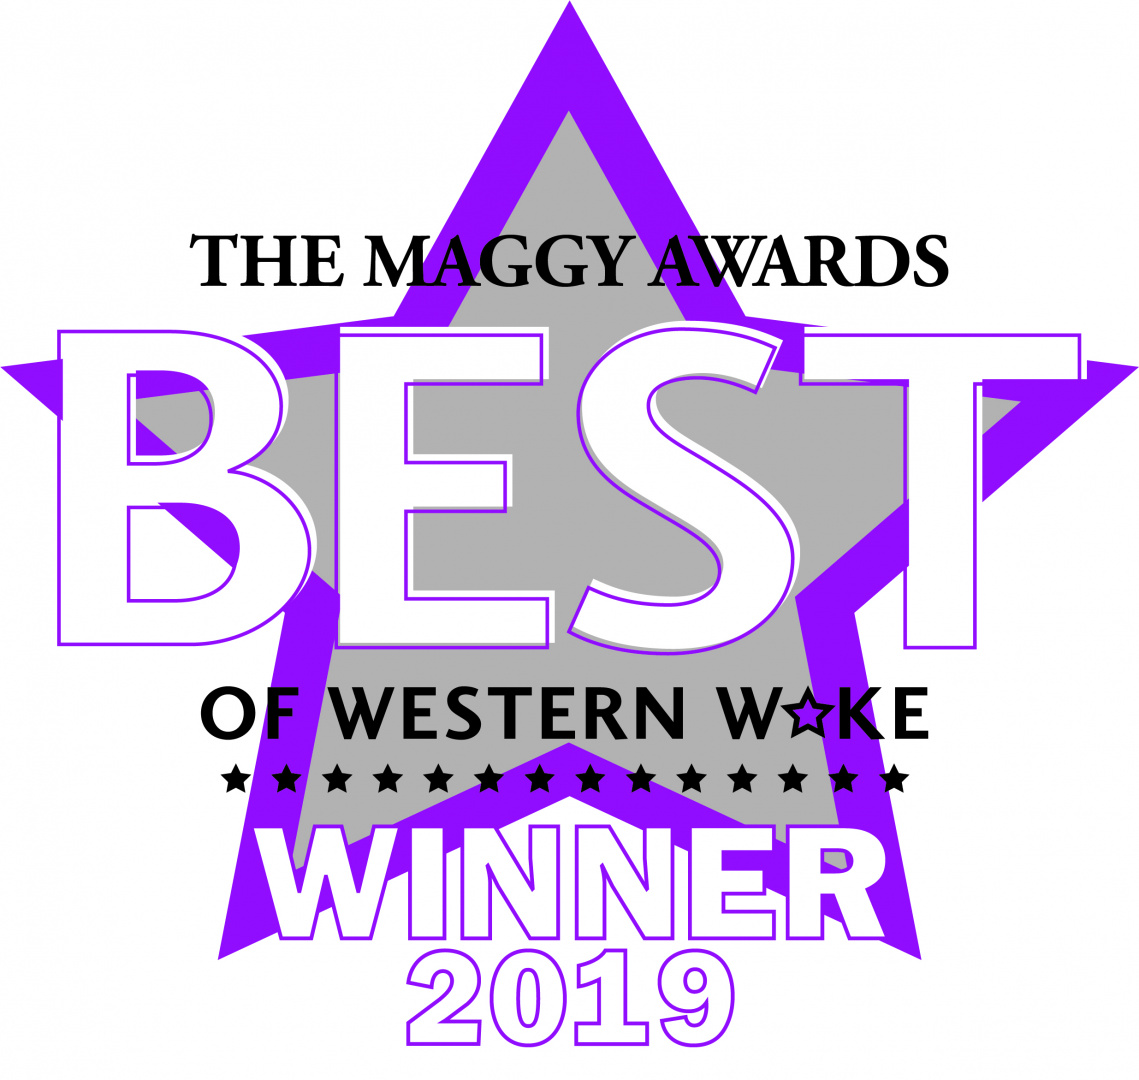 Triangle Wine Company winner 2019 Best of Western Wake Cary Magazine Maggy Award Best Wine Store